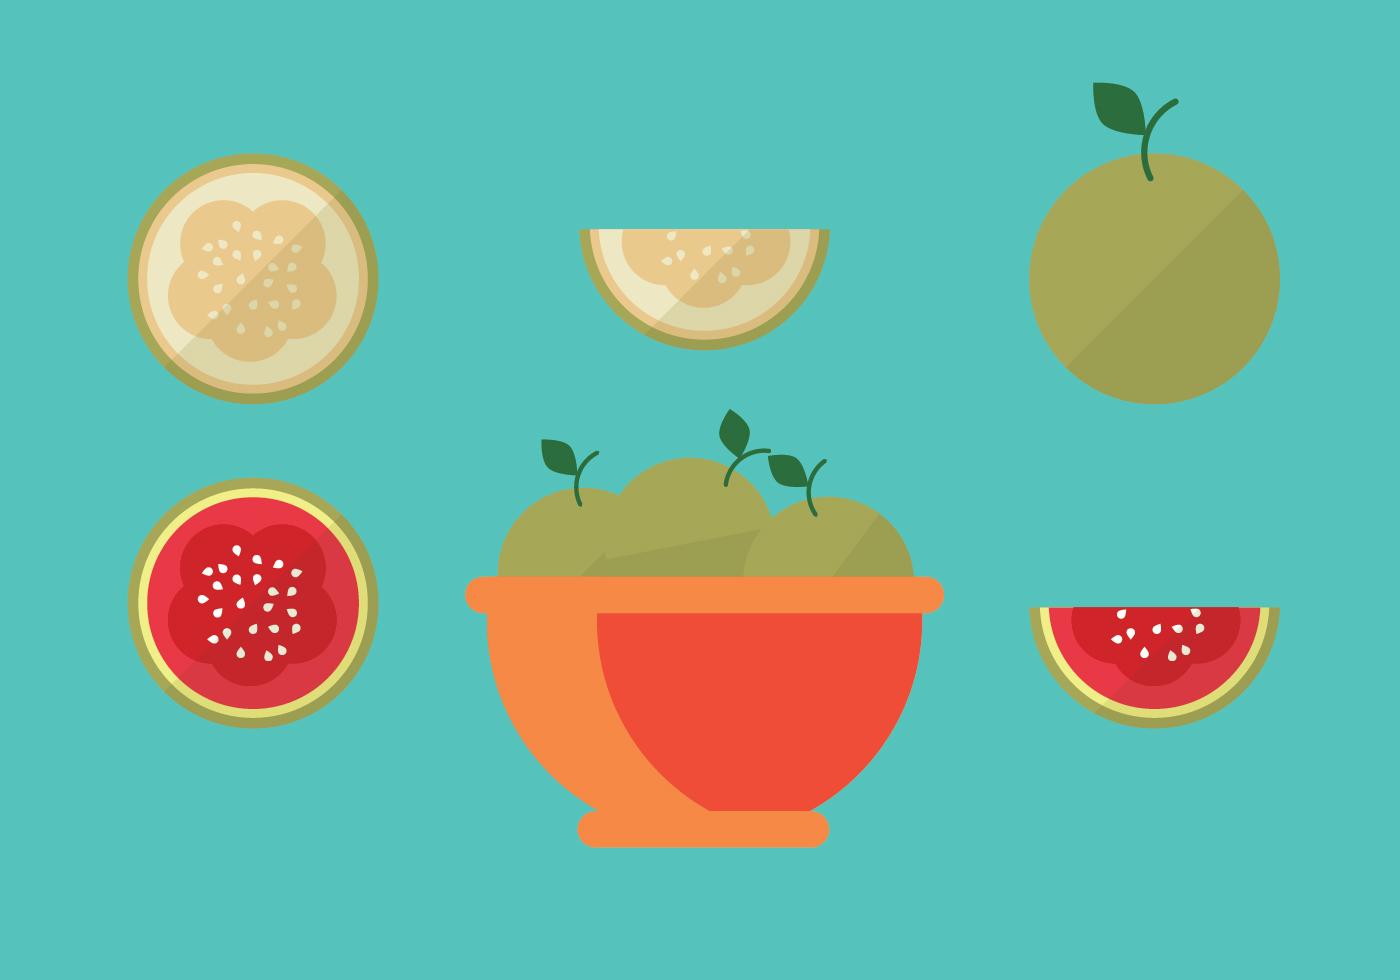 Guava Vector Pack - Download Free Vector Art, Stock ... | 1400 x 980 jpeg 205kB